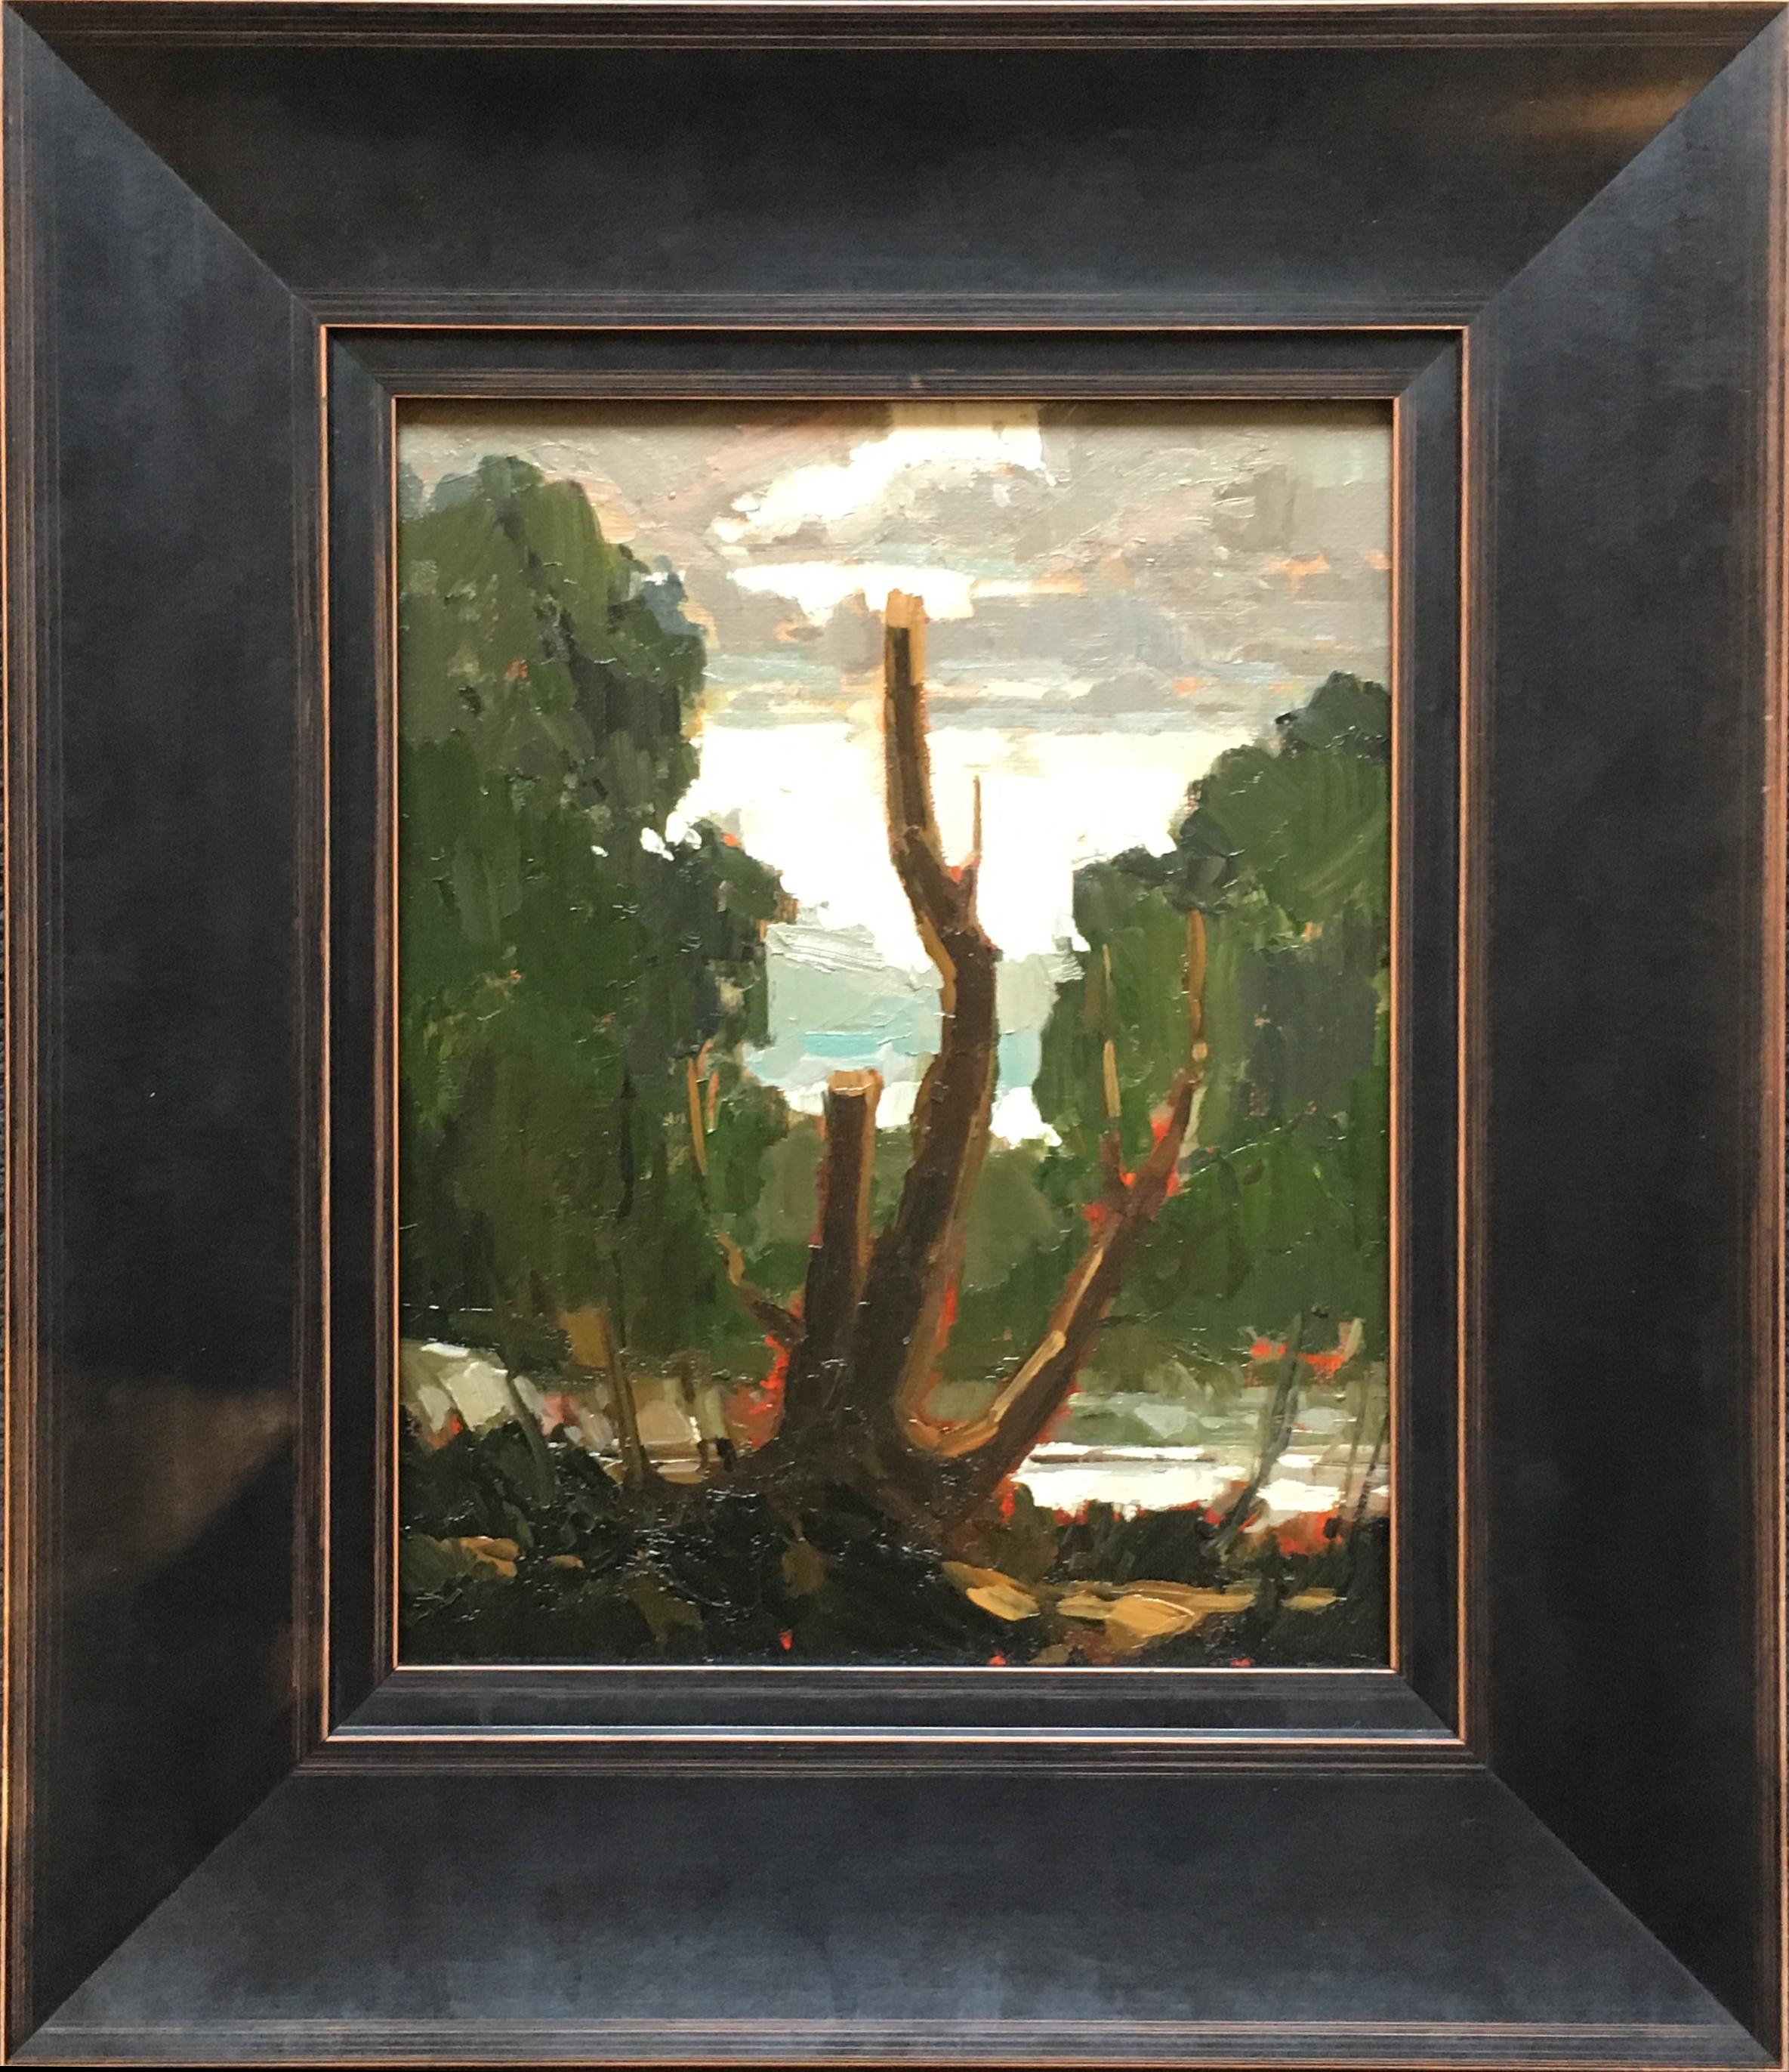 SOLD II Old Tree Along the Avon by Jamie Jardine